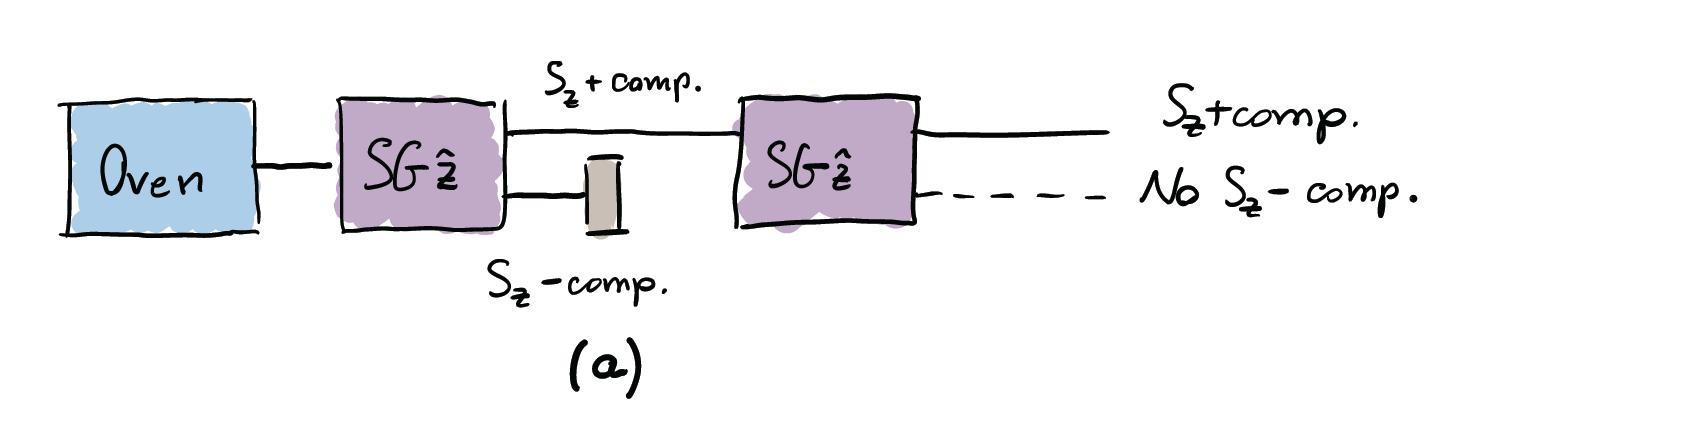 Figure1_Discover_Superposition-09